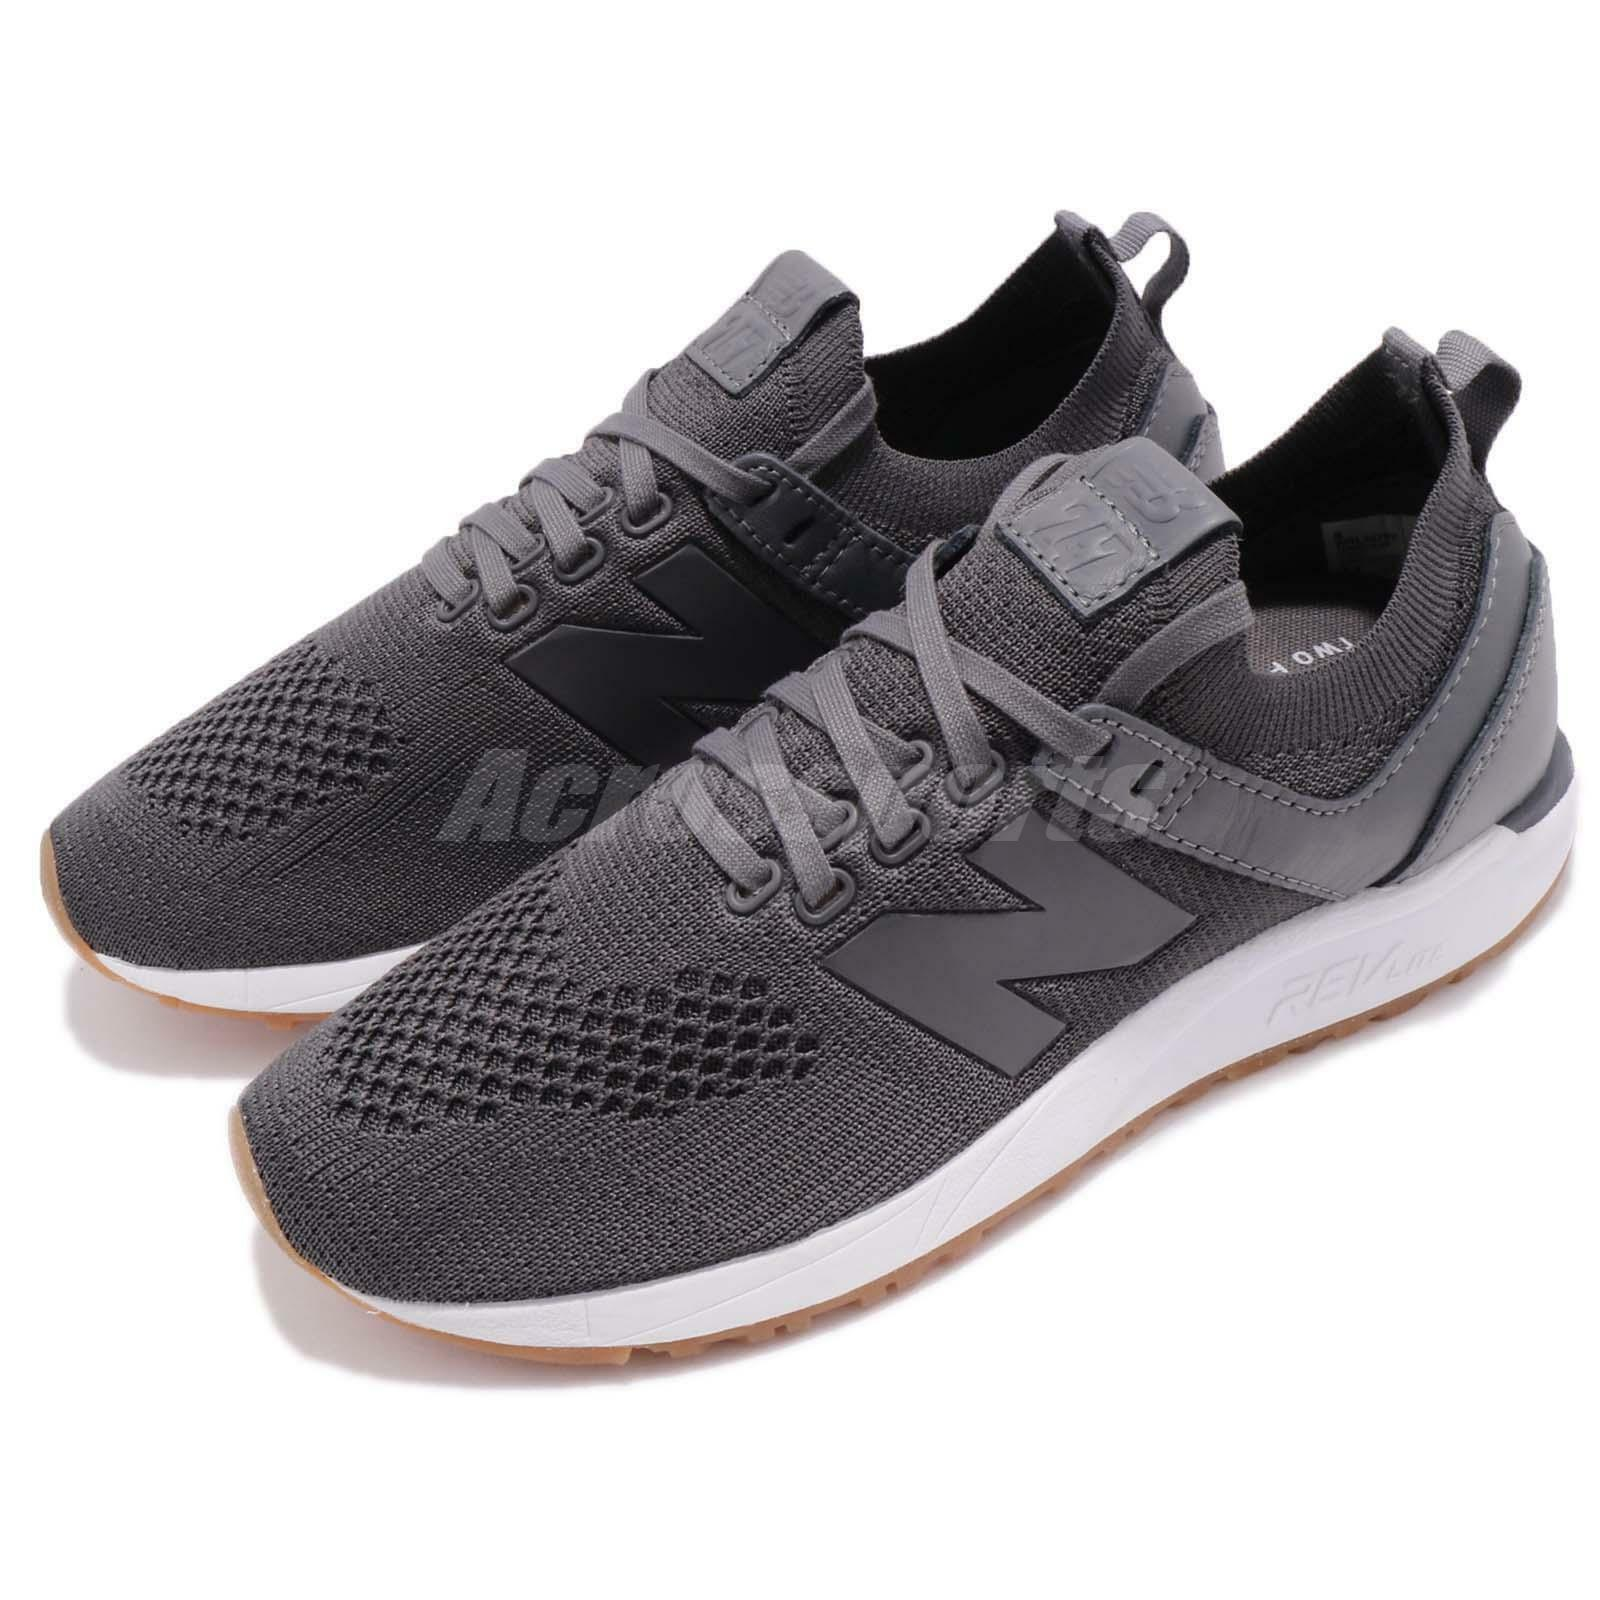 New Balance WRL247SY B 247 Grey White Gum Women Running shoes Sneakers WRL247SYB